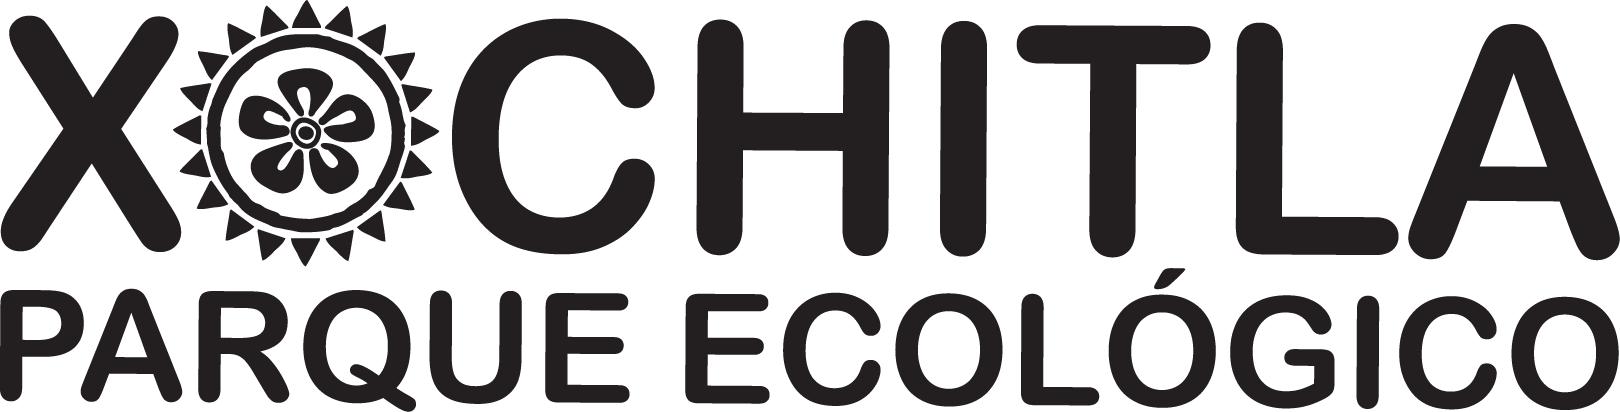 Fundación Xochitla, A. C.